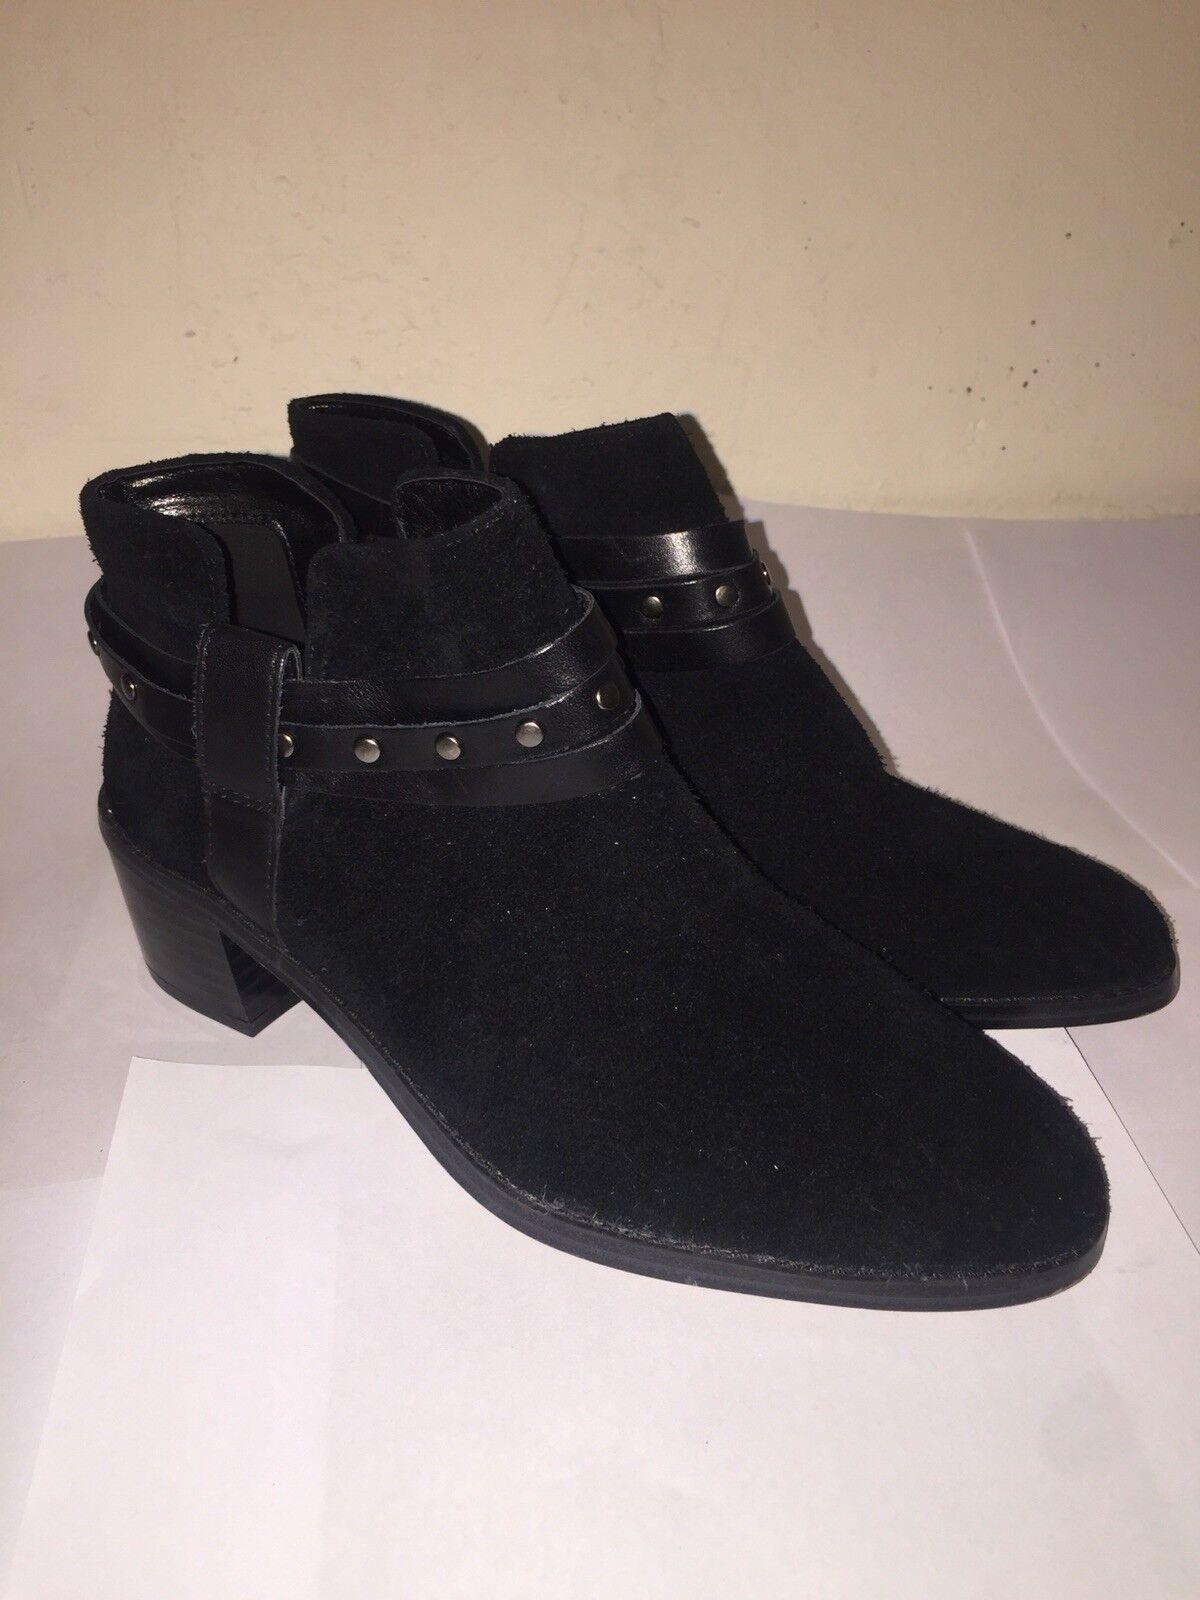 BRECCAN SHINEClark's Women Ladies Black Suede Boots.